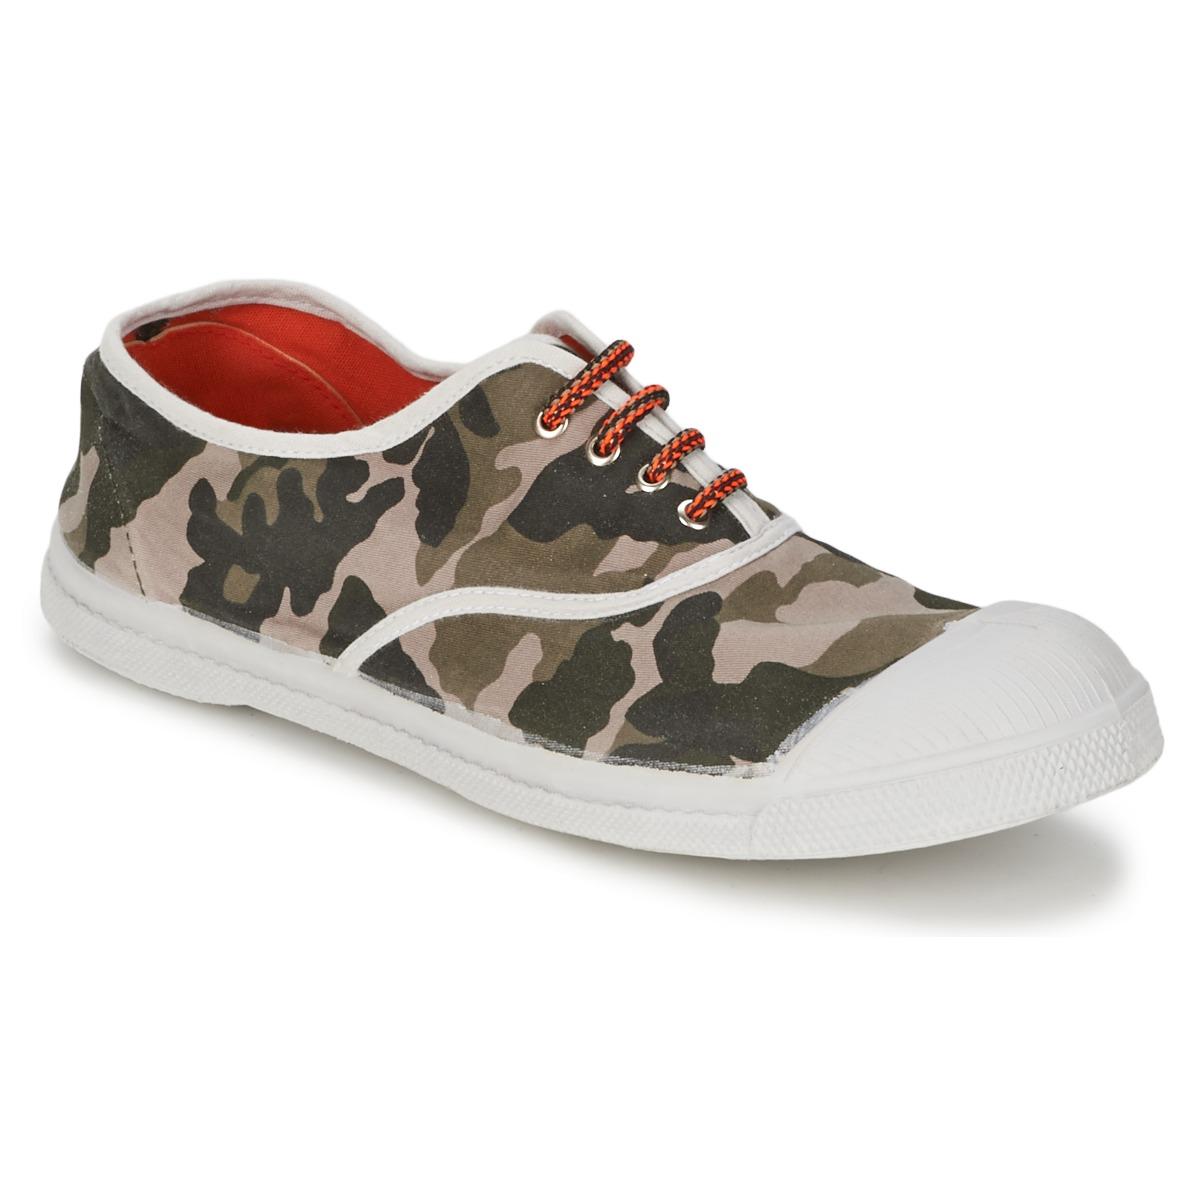 Bensimon TENNIS CAMOFLUO Camouflage